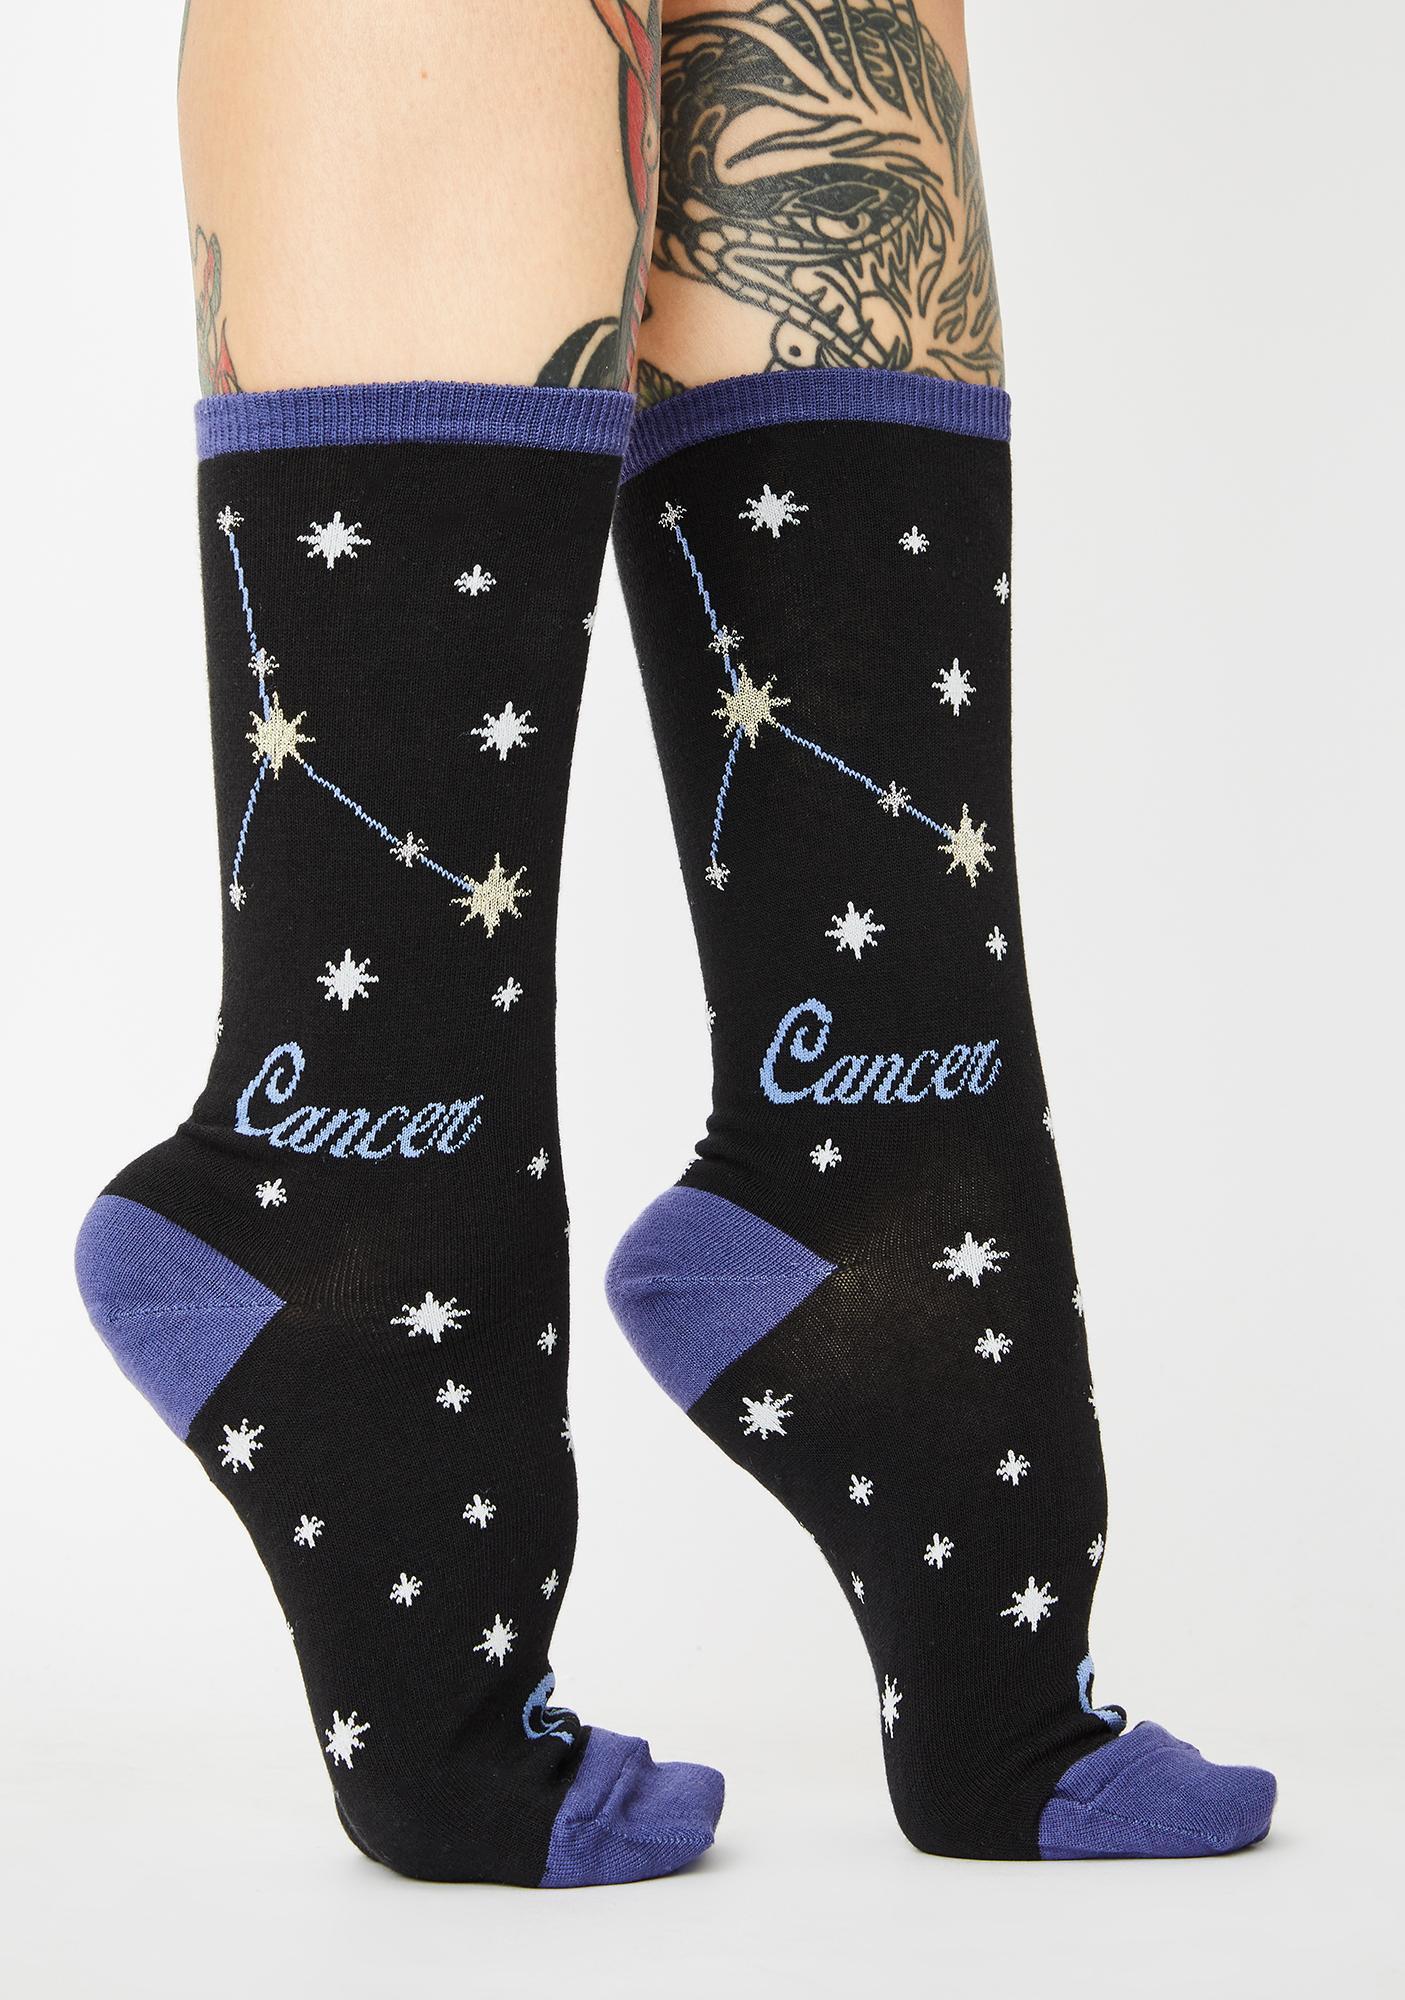 Socksmith Design Cancer Crew Socks